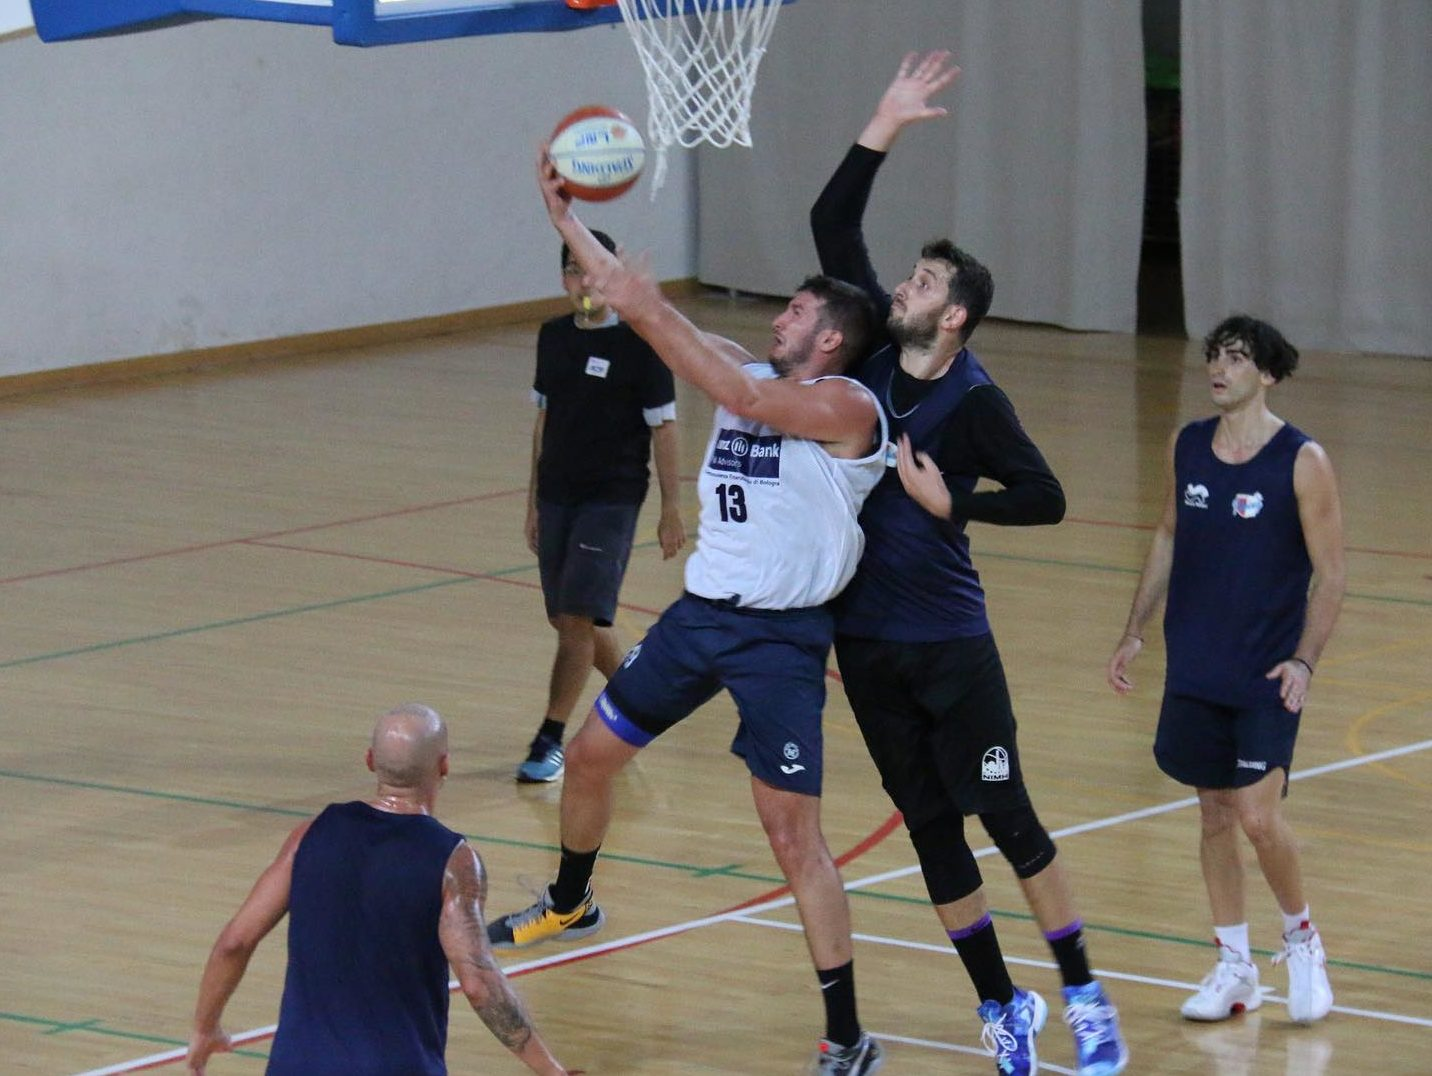 Bologna Basket: Squadra Giovane E Ambiziosa Allenata Da Fucka